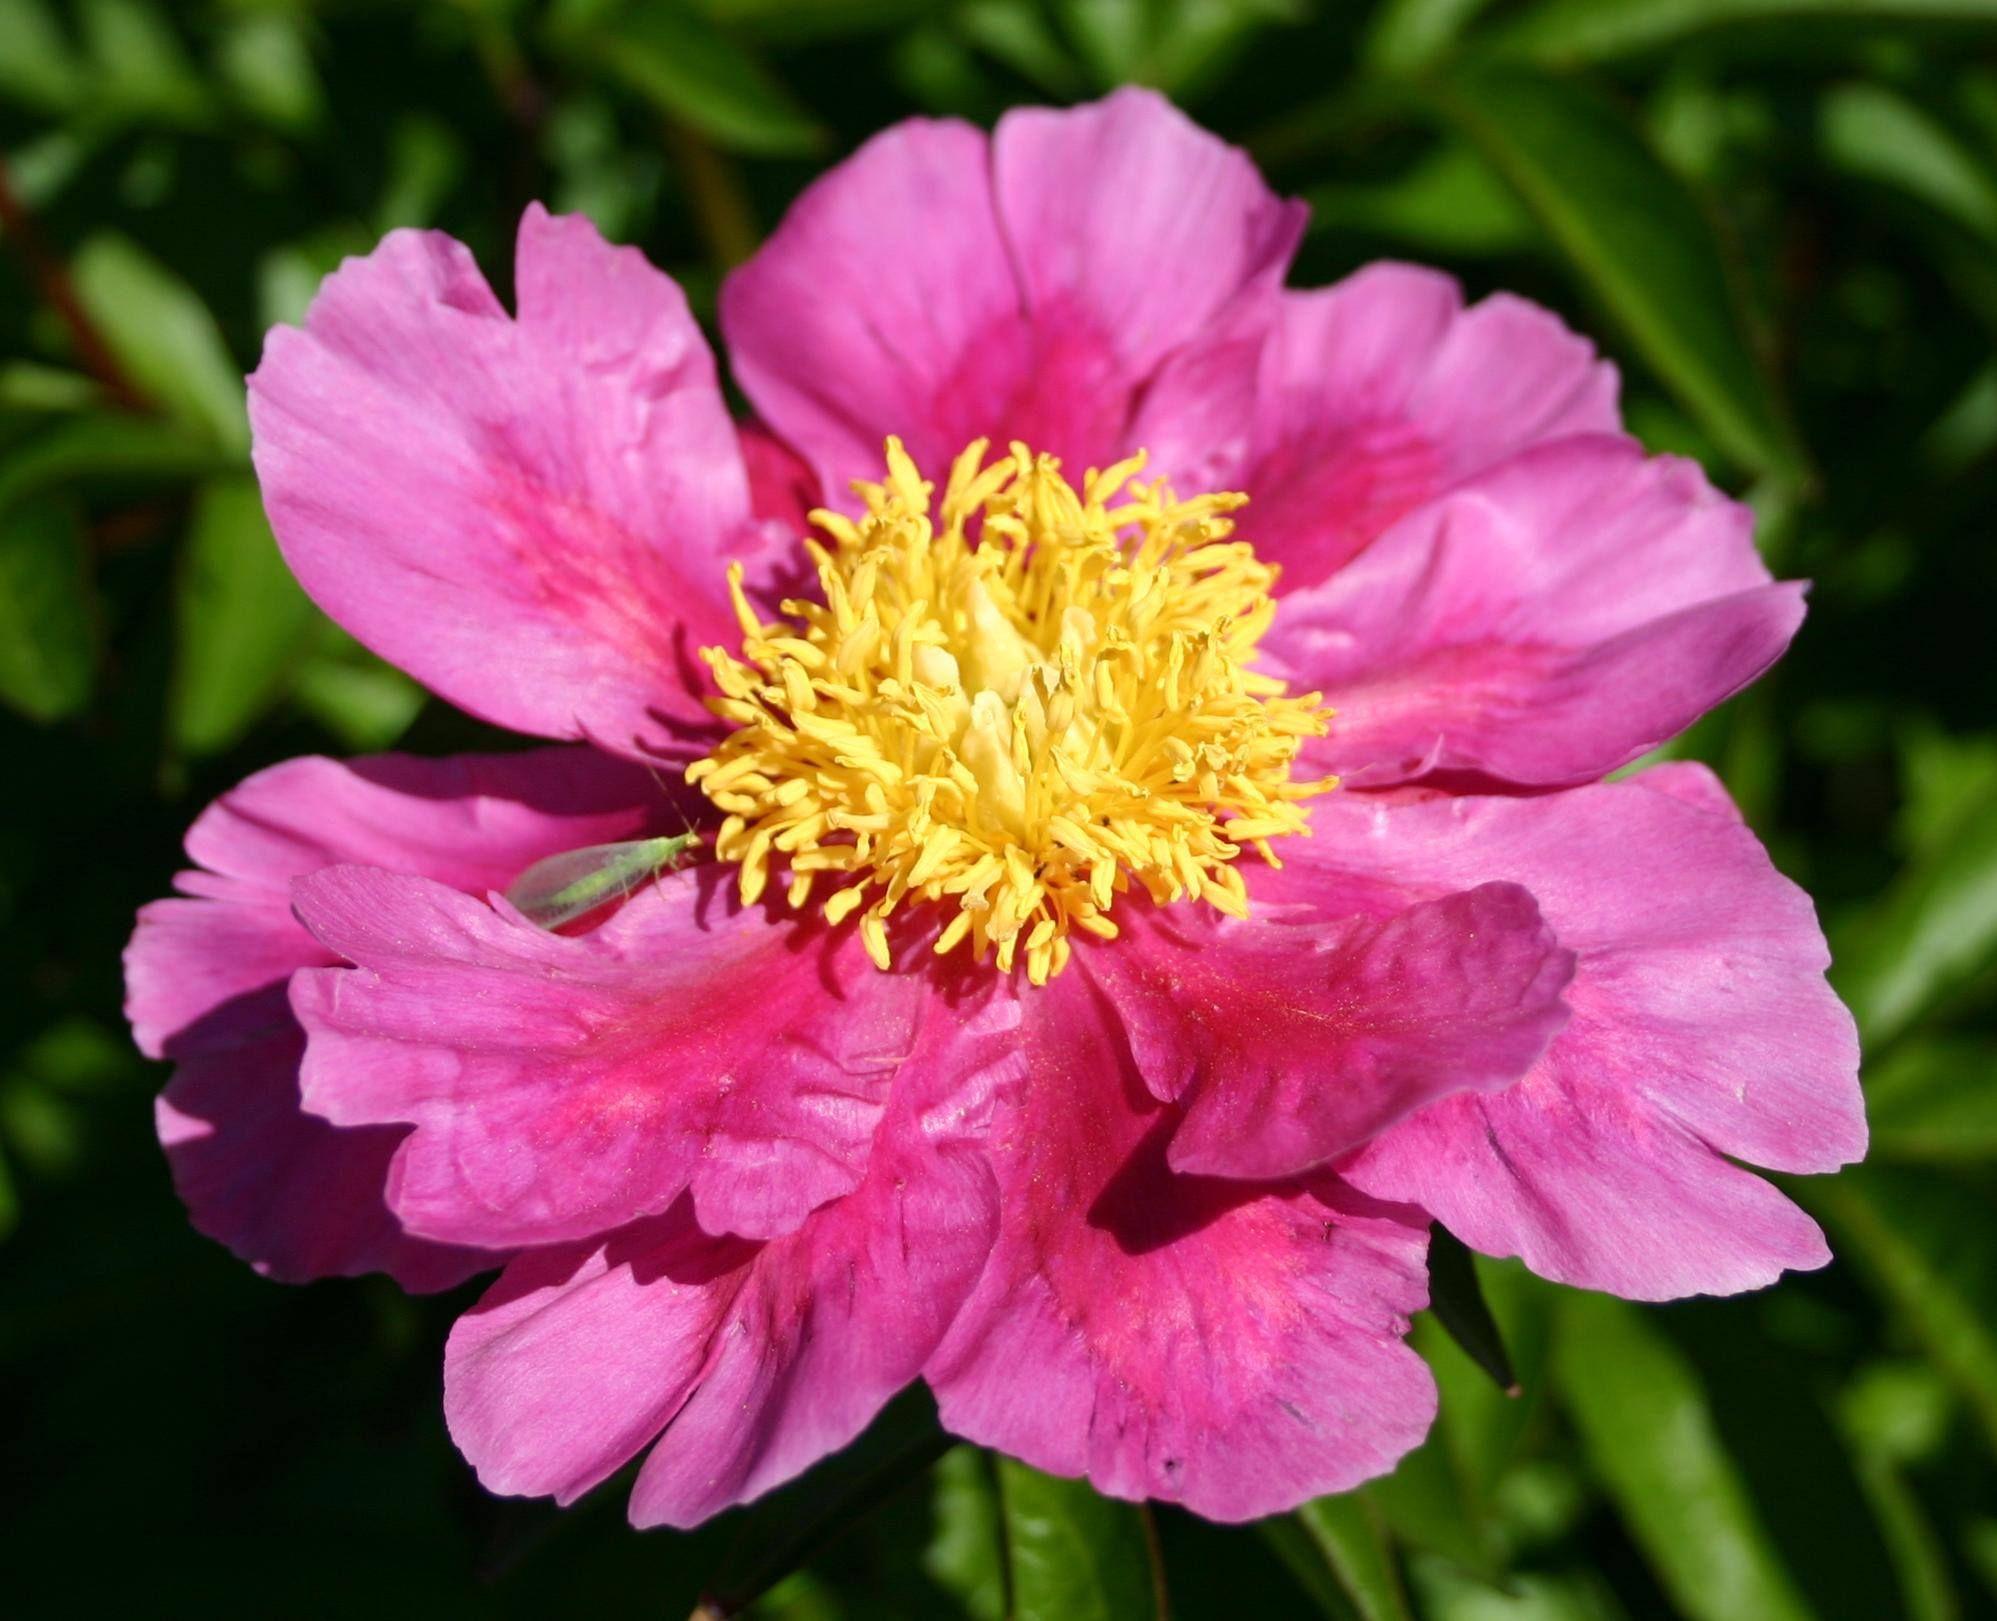 Large Single Petal Anemone Yellow Center Pink Cut Peony Flower